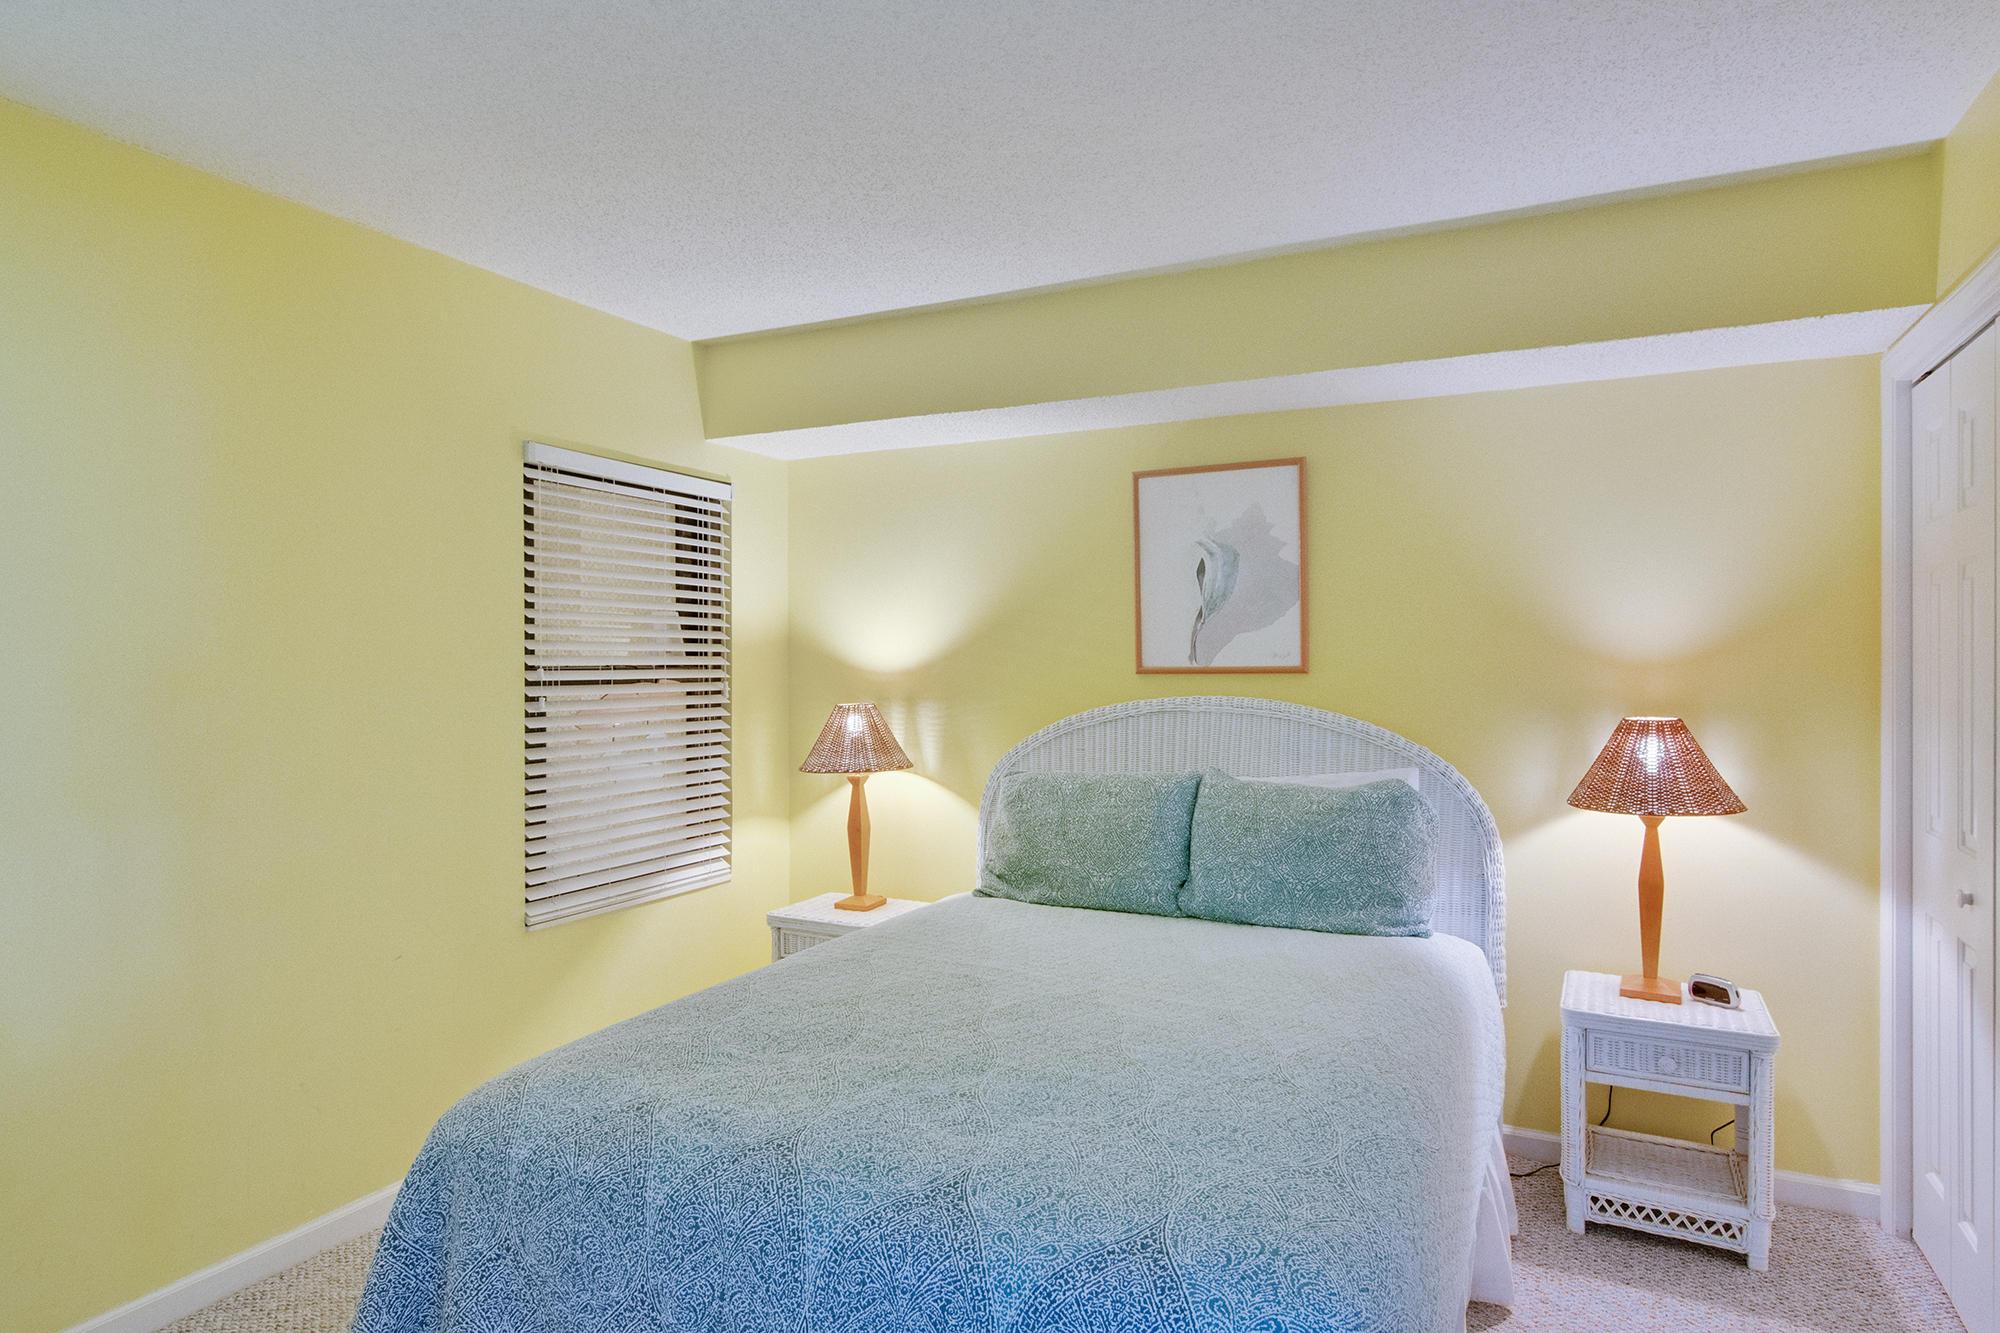 Charleston Oceanfront Villas Homes For Sale - 201 Arctic, Folly Beach, SC - 11